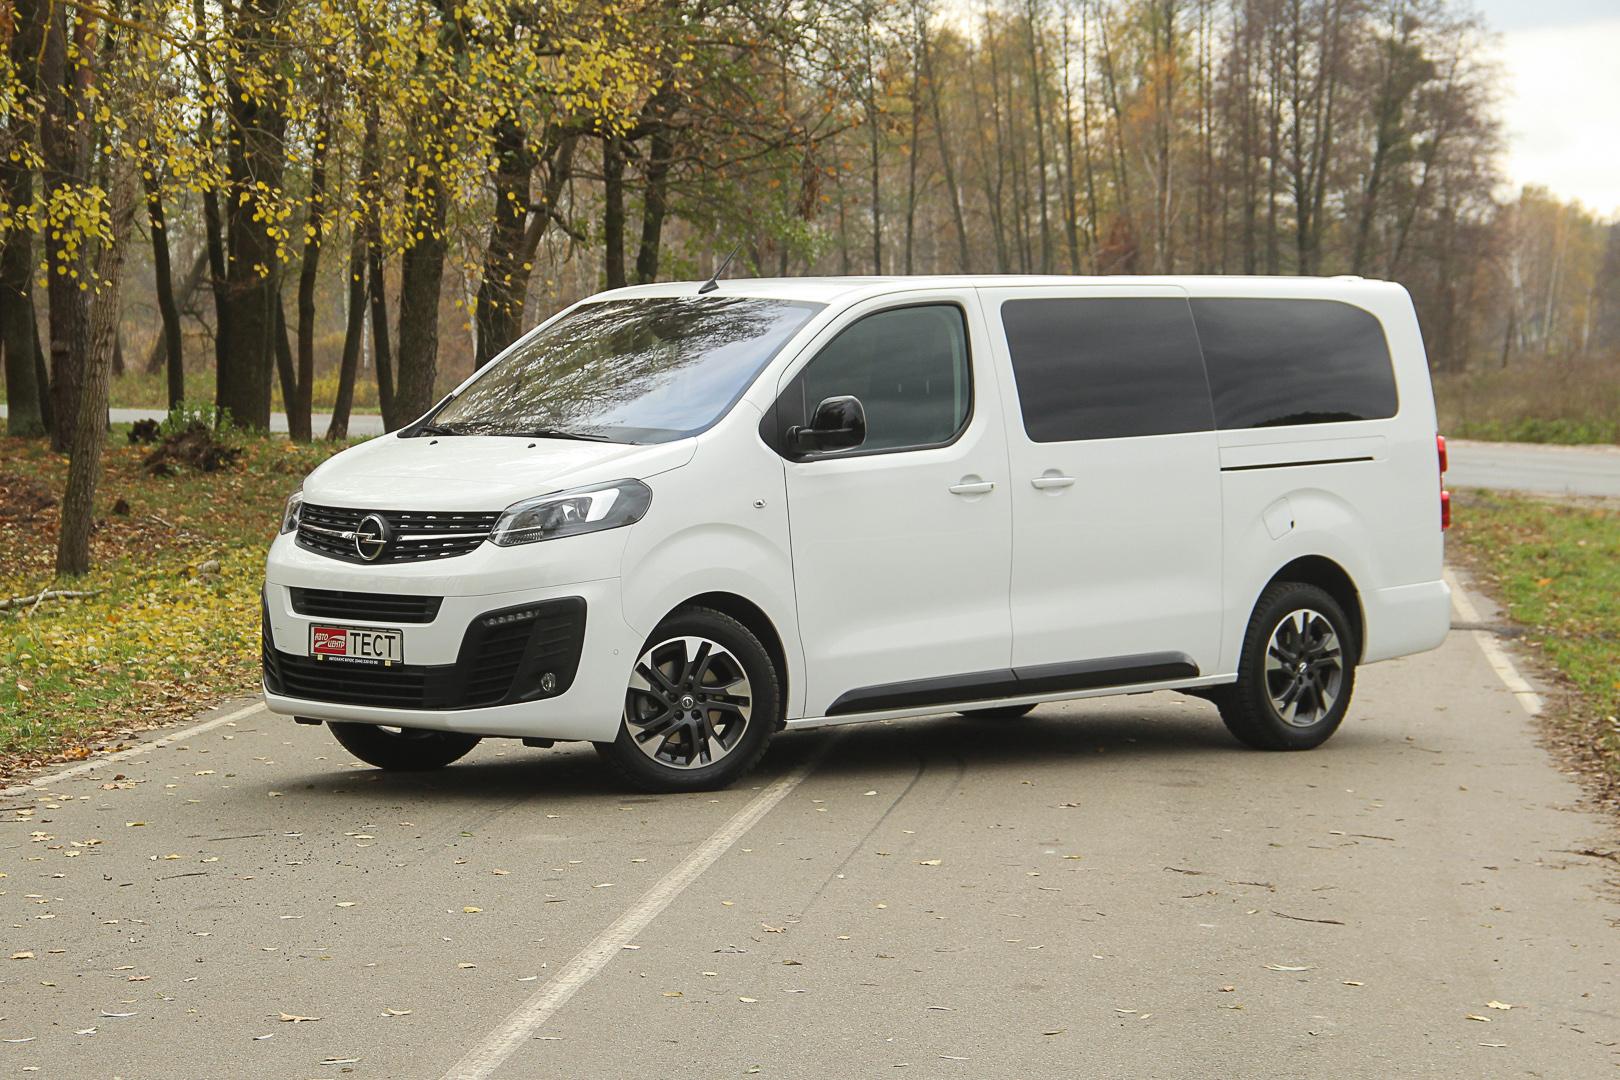 Тест-драйв Opel Zafira Life: полярный экспресс или помощник в бизнесе и путешествиях (видео)